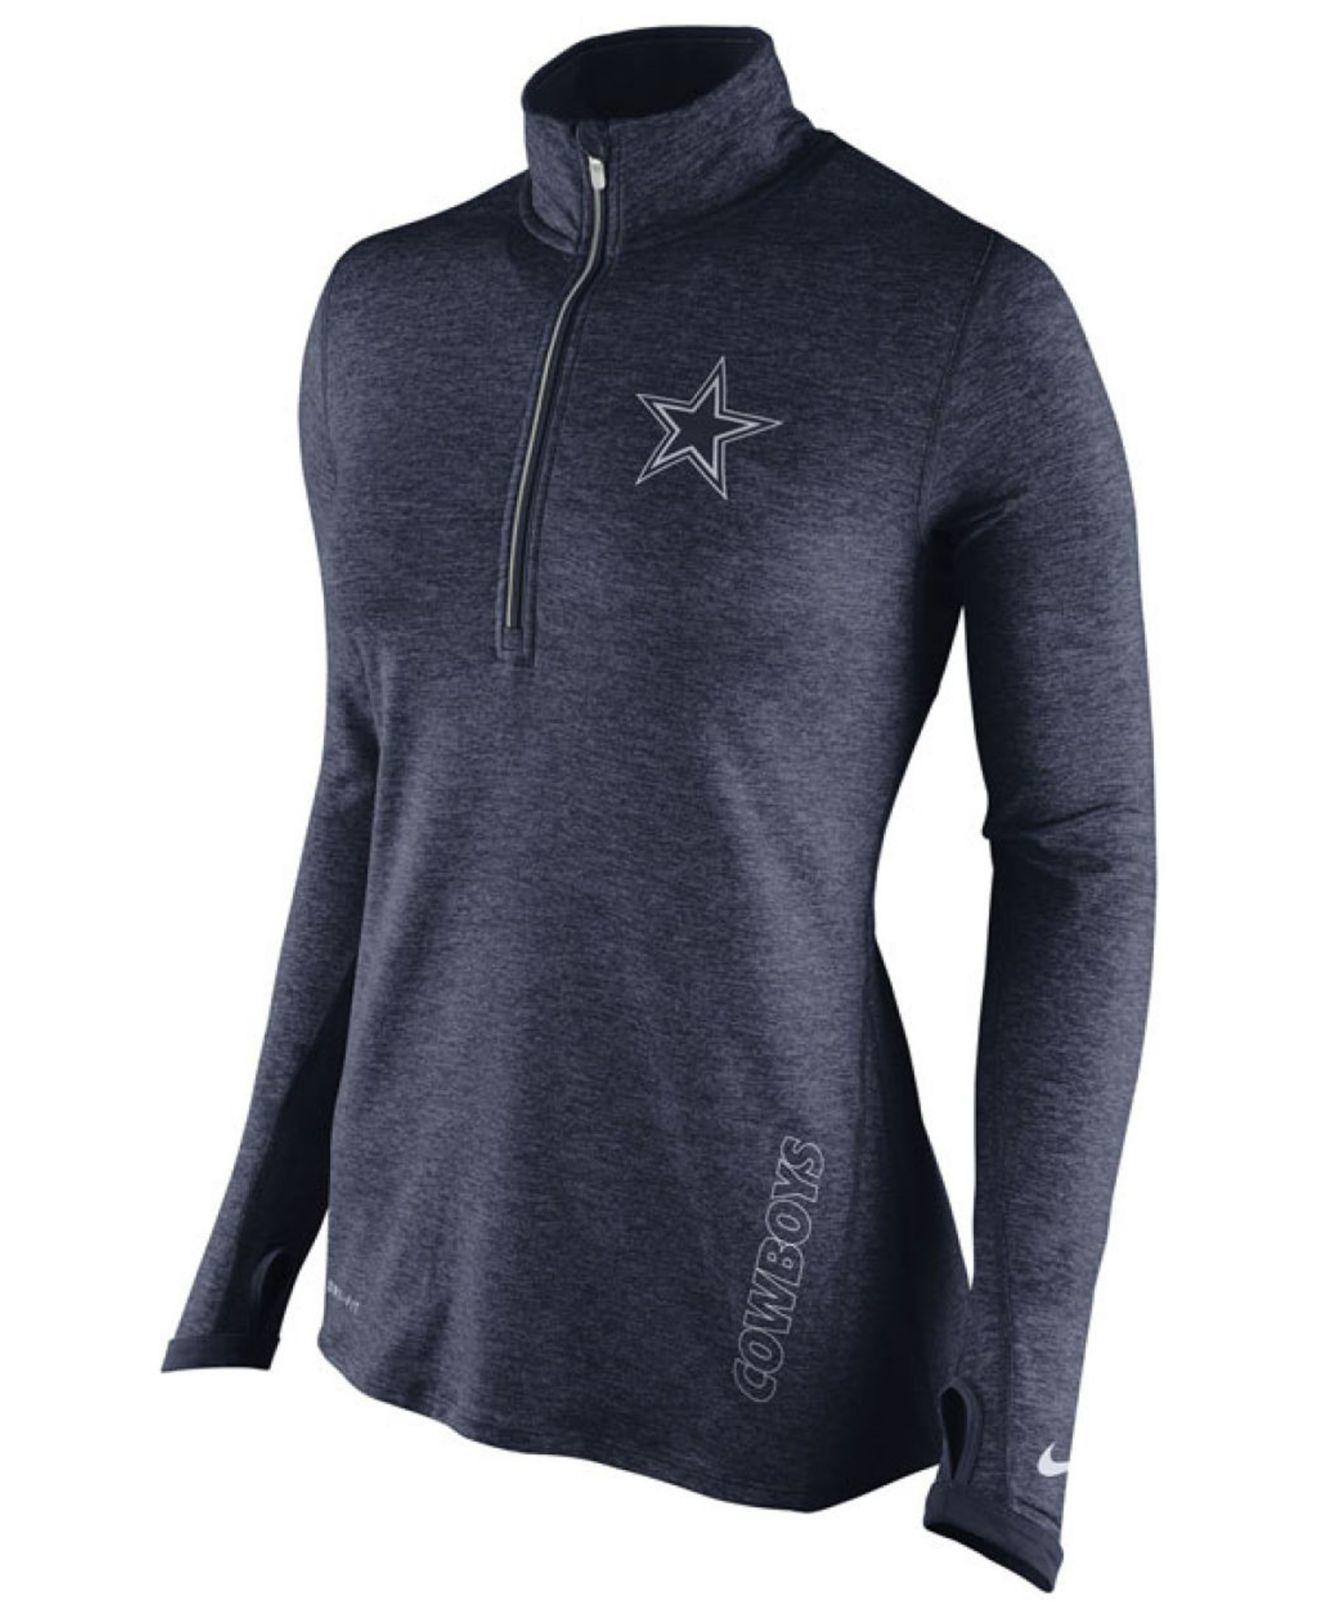 7cb032cd653 Nike Women's Dallas Cowboys Stadium Element Quarter-zip Pullover in ...